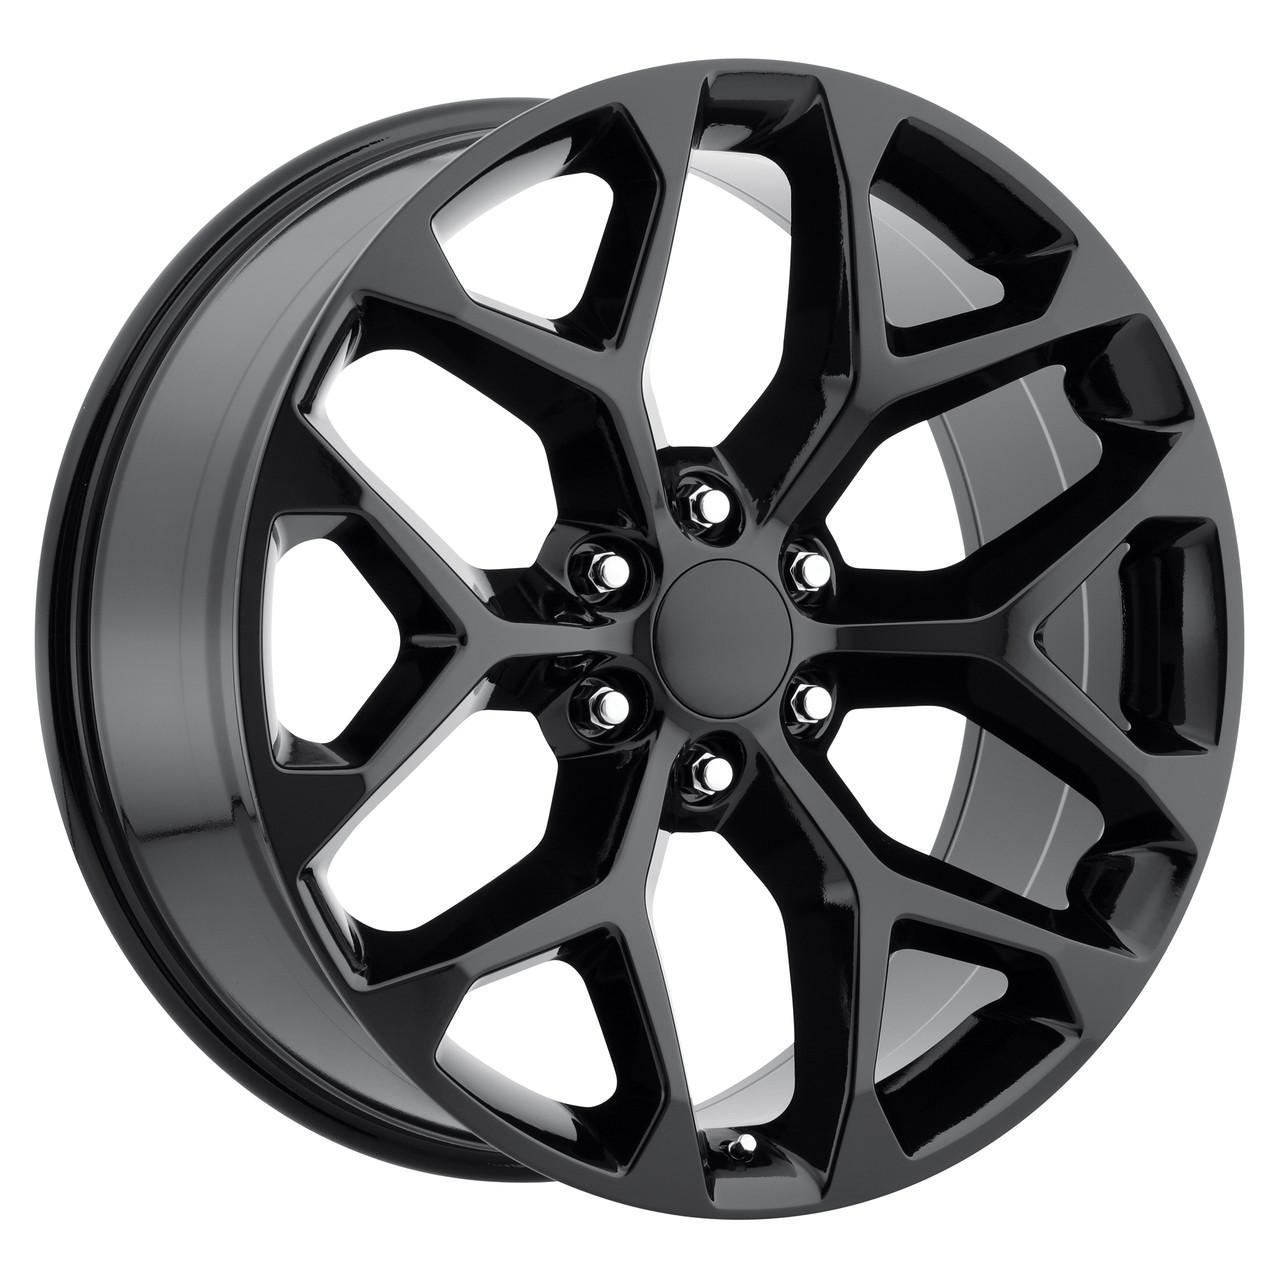 22 2015 Ck156 Ck 156 Chevy Silverado Gmc Sierra 1500 Cadillac Gloss Black Wheels Set Of 4 22x9 Rims Stock Wheel Solutions